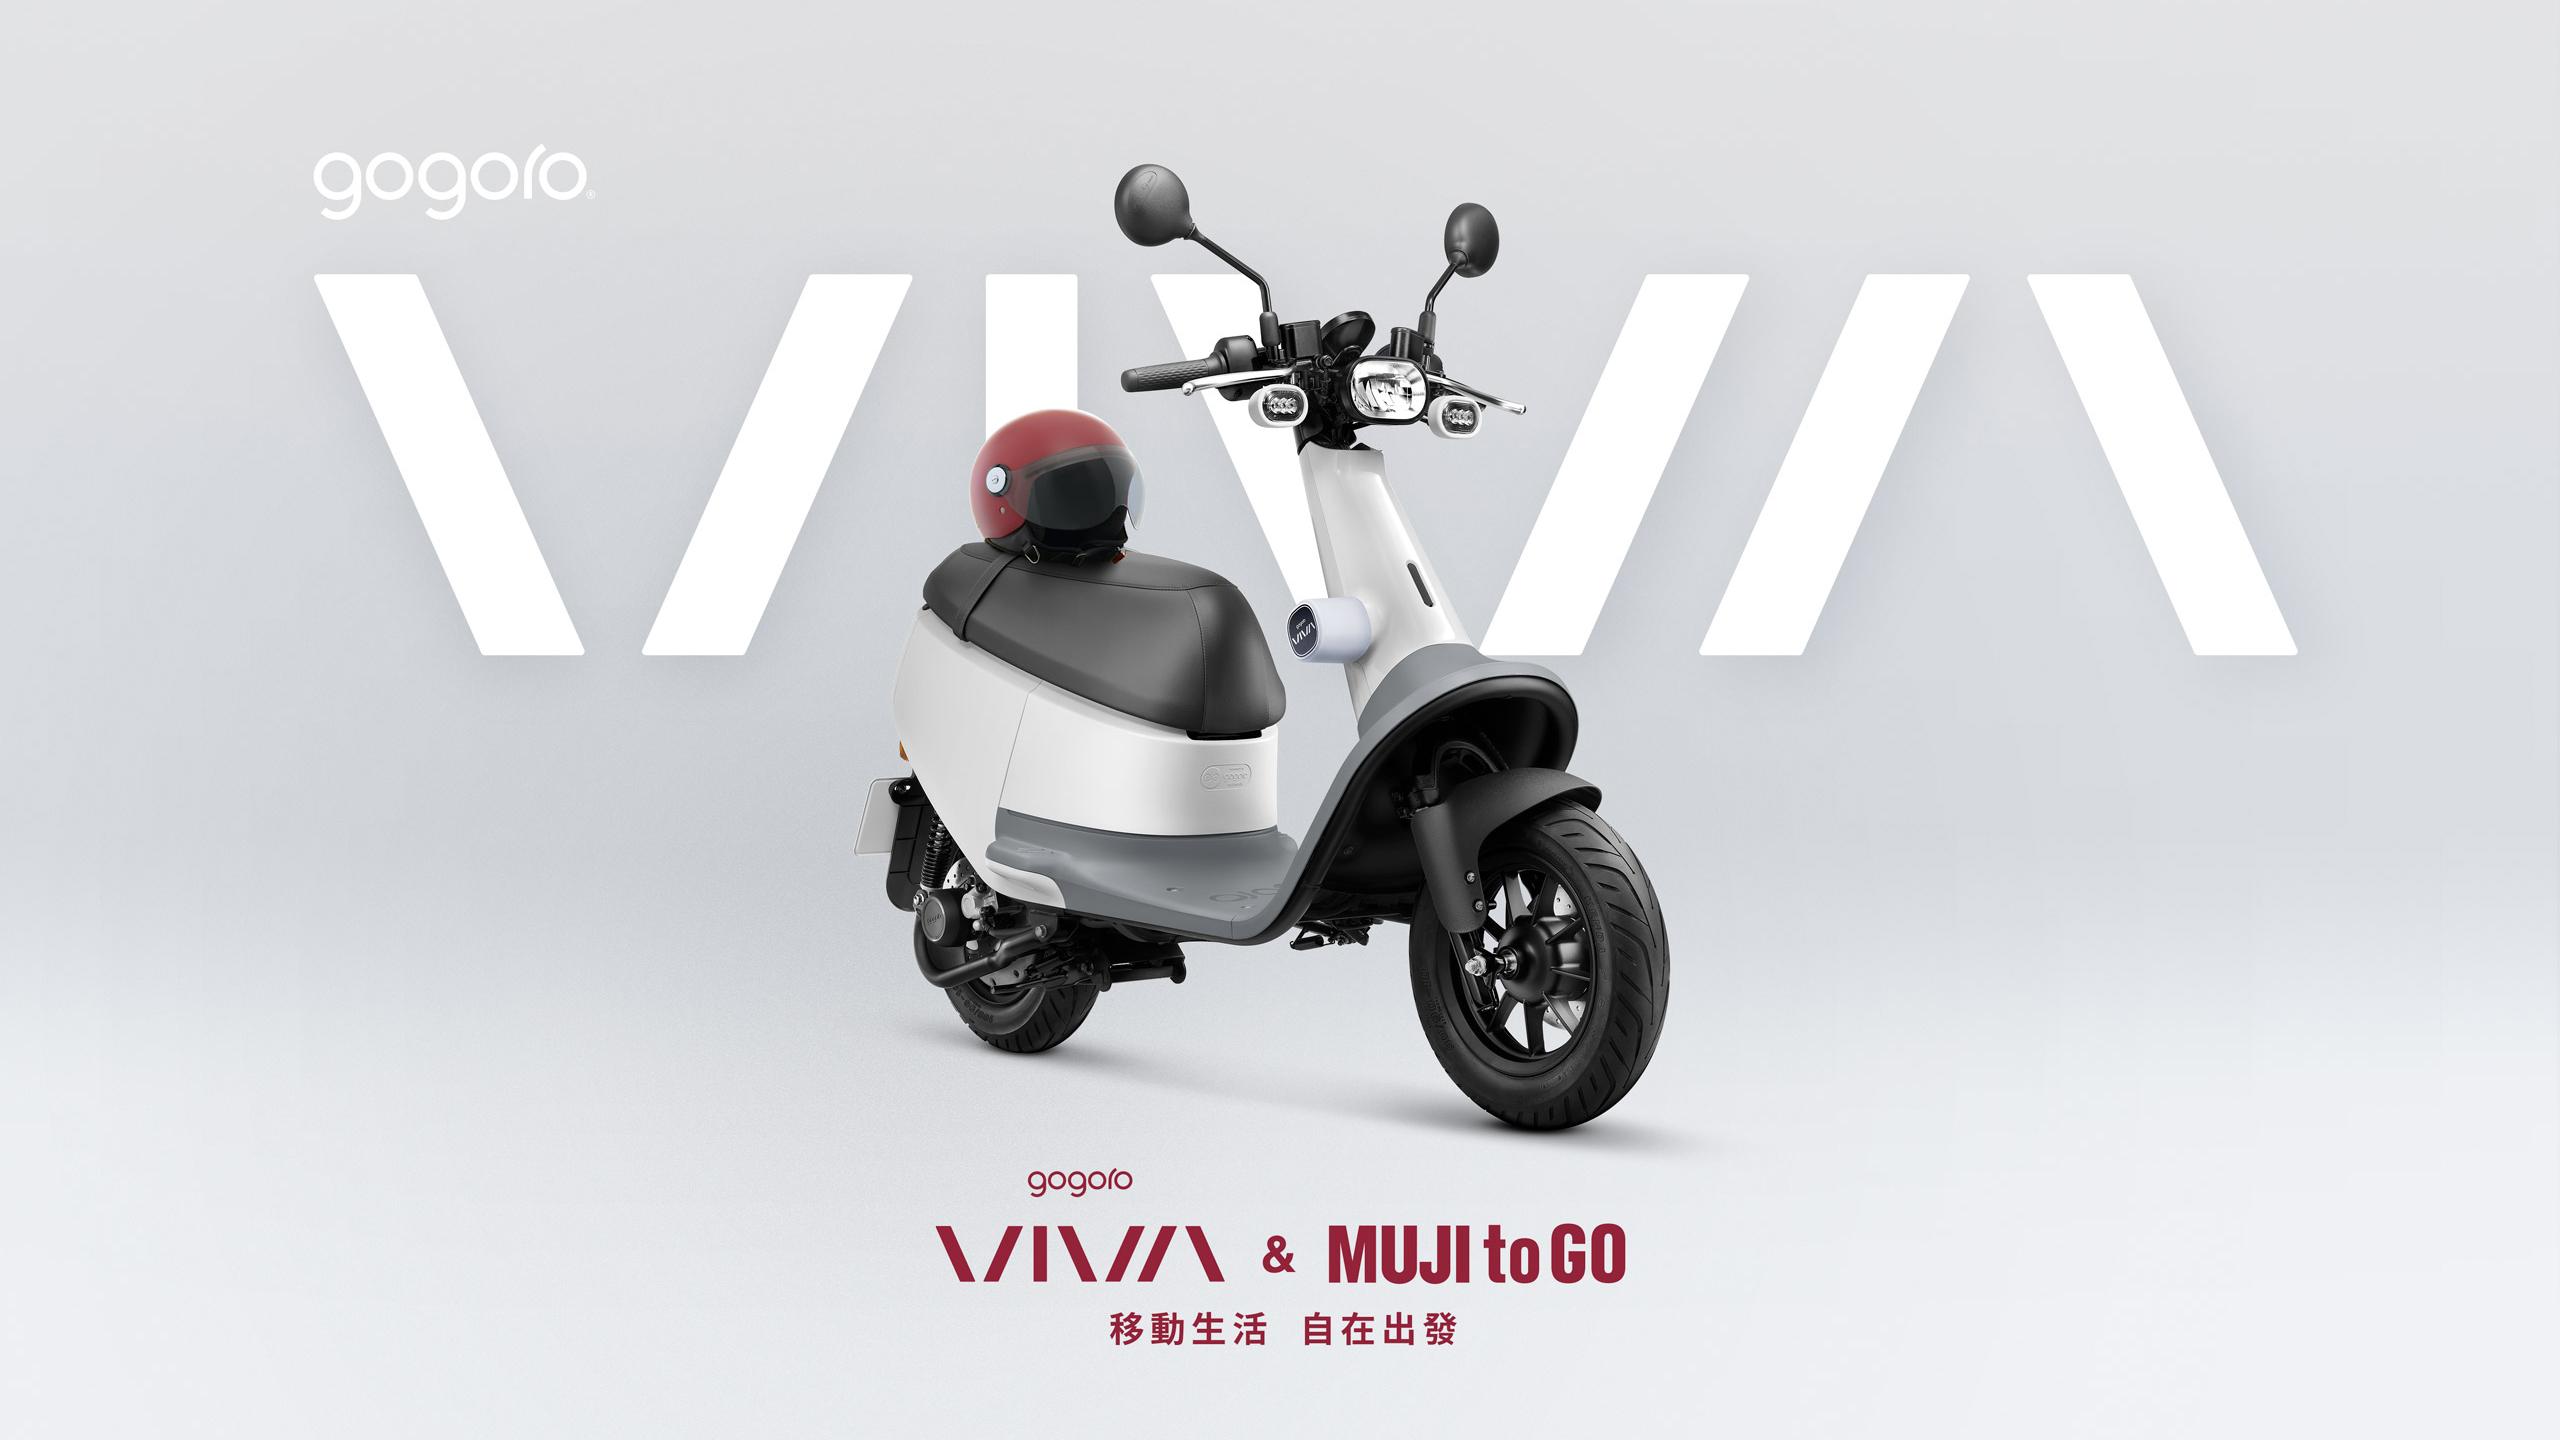 Gogoro 推出「Gogoro VIVA Plus 無印白」聯名款,同場加映系統更新